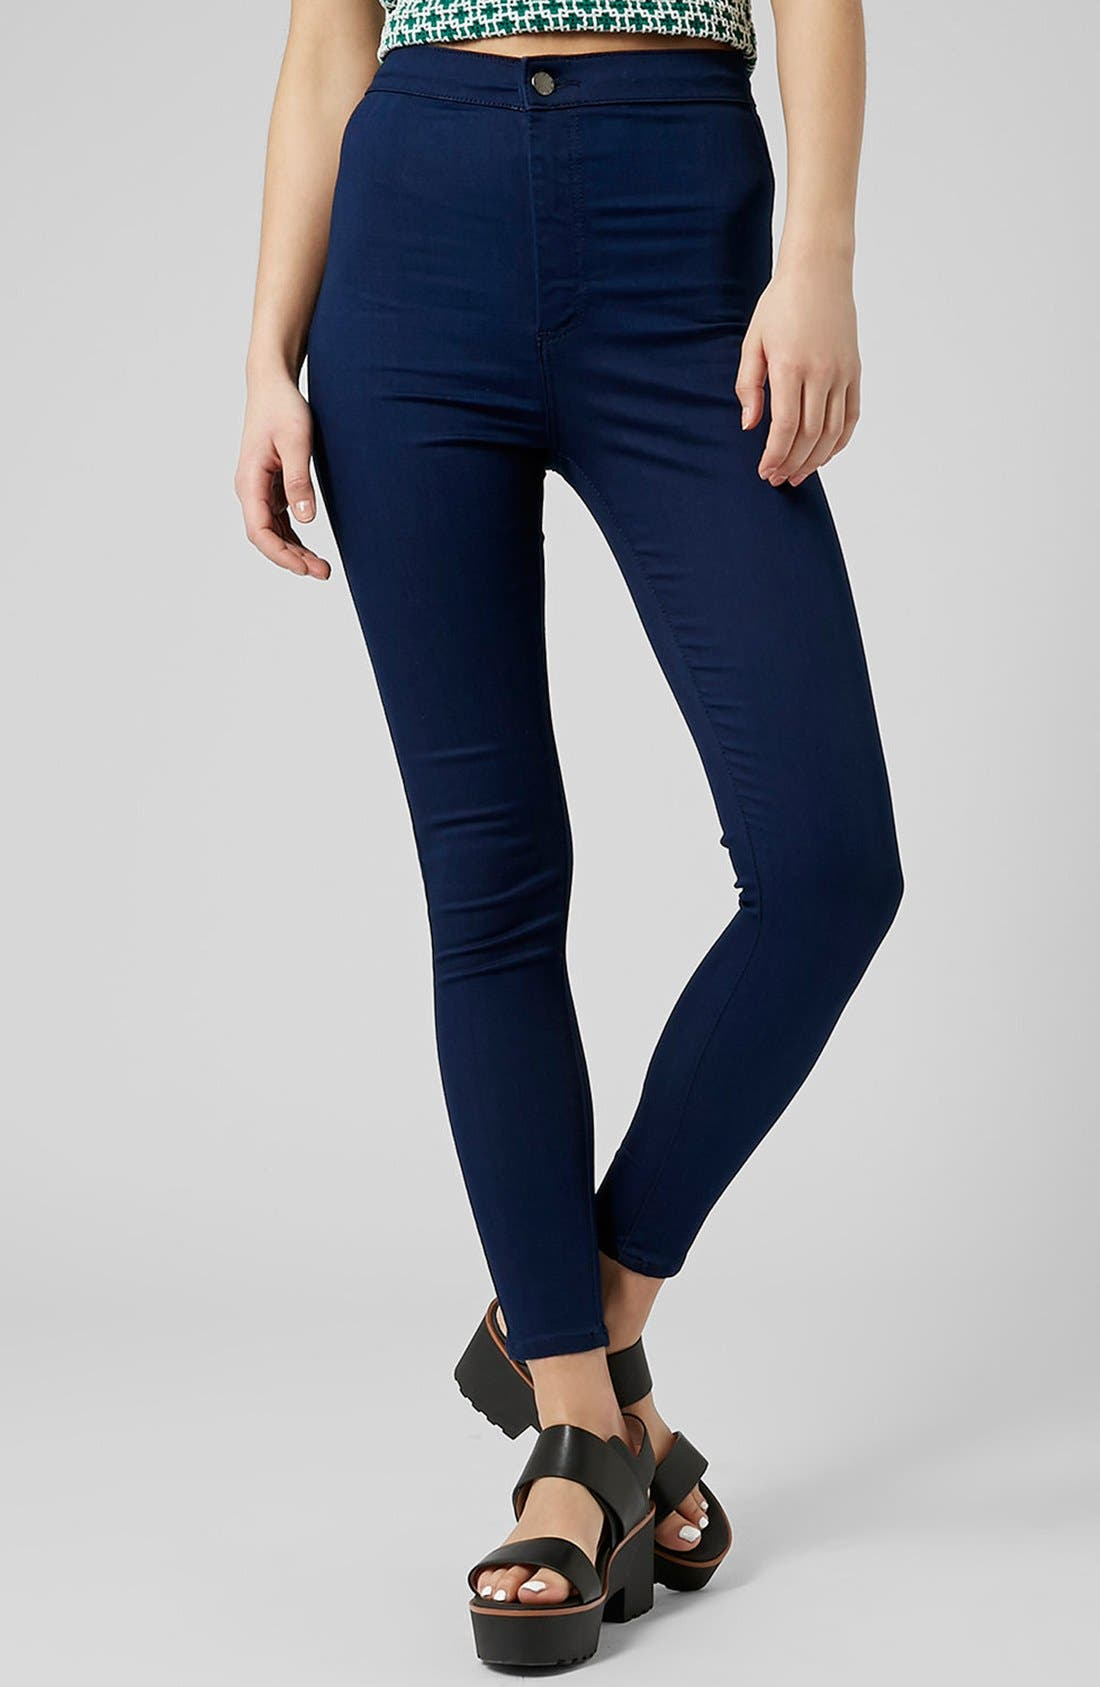 Main Image - Topshop Moto 'Joni' High Rise Skinny Jeans (Bright Blue)